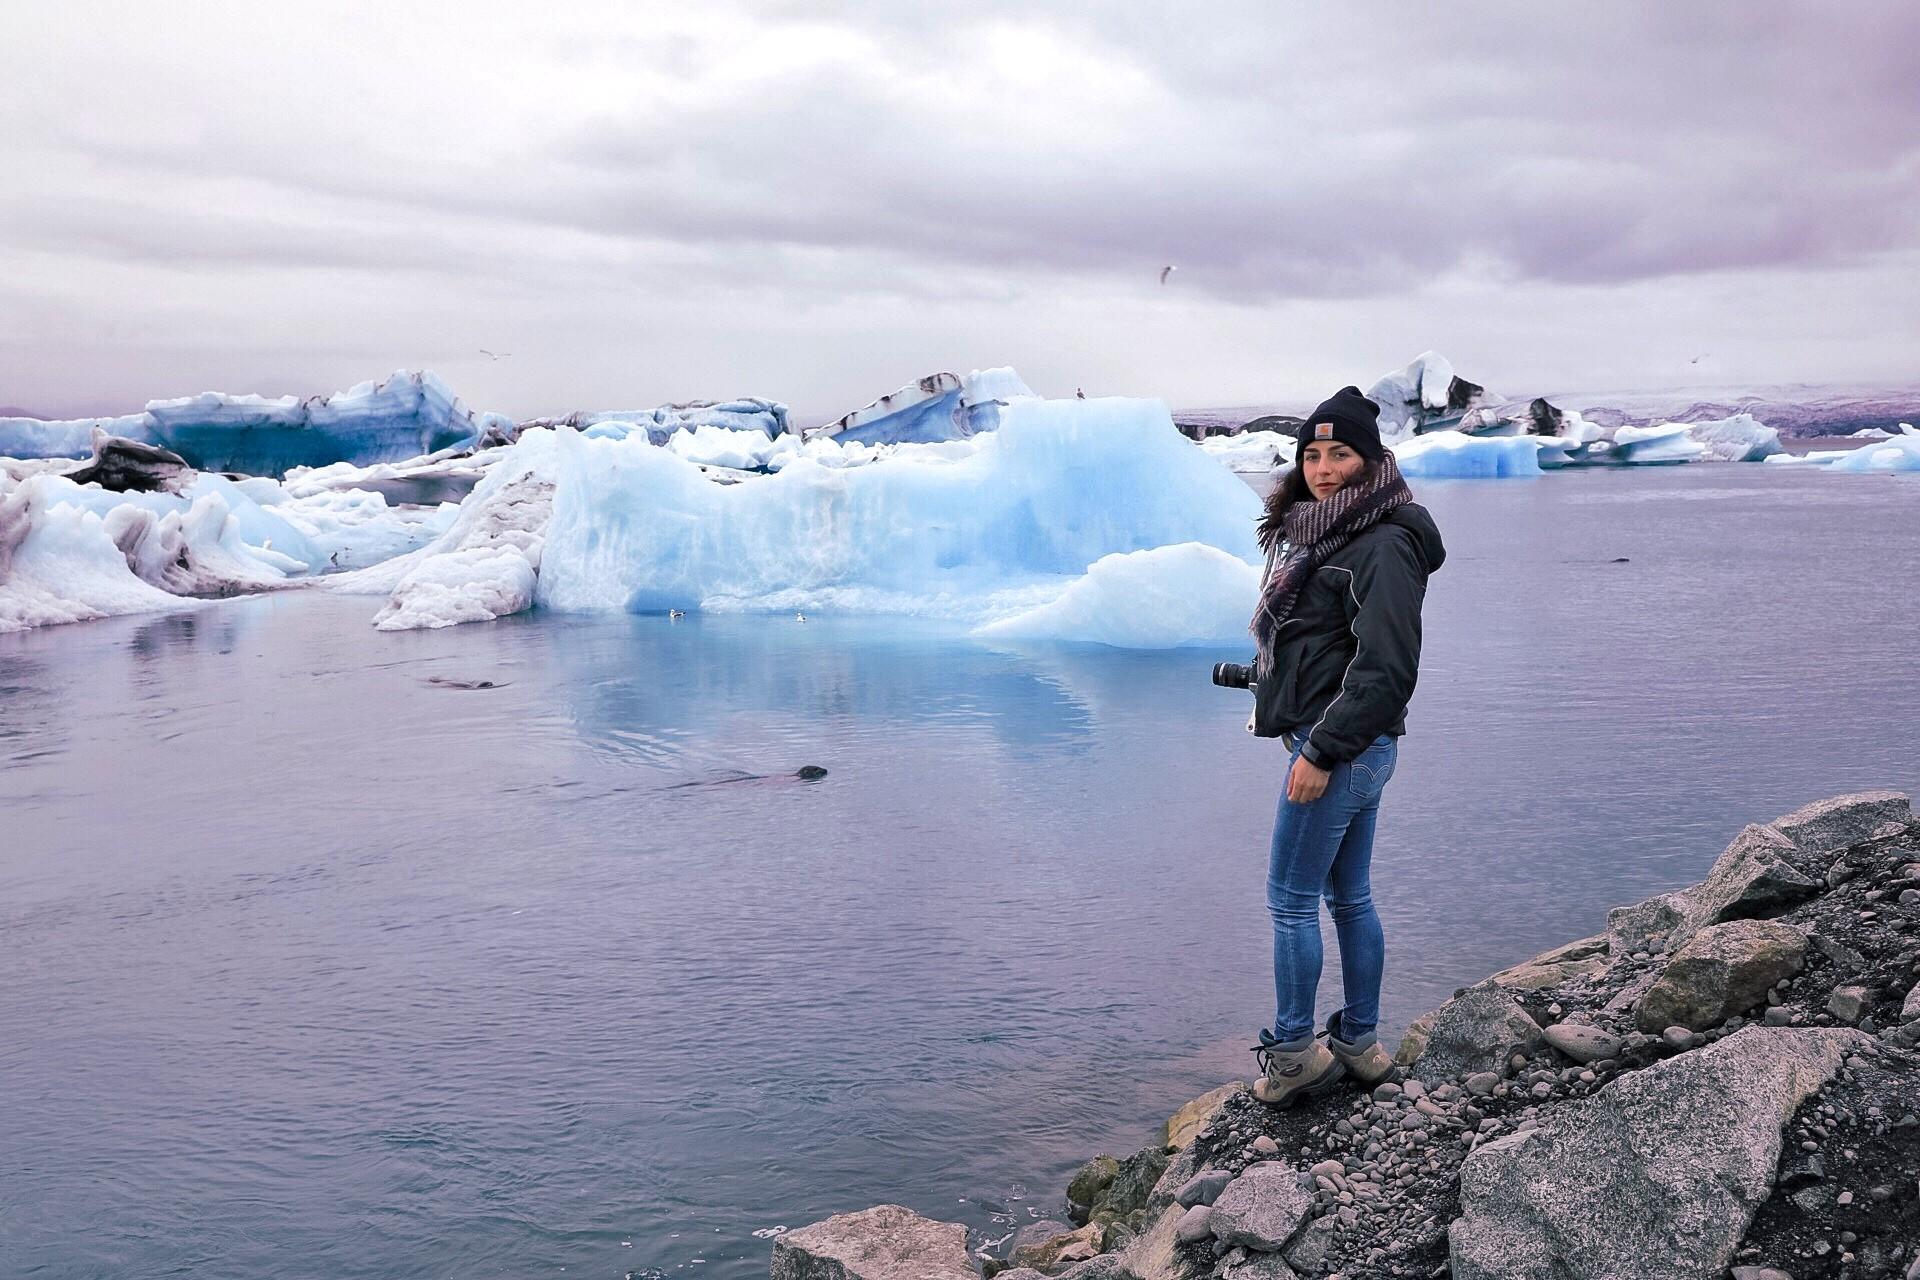 laguna-glaciale-jokulsarlon-b1ca328deccc